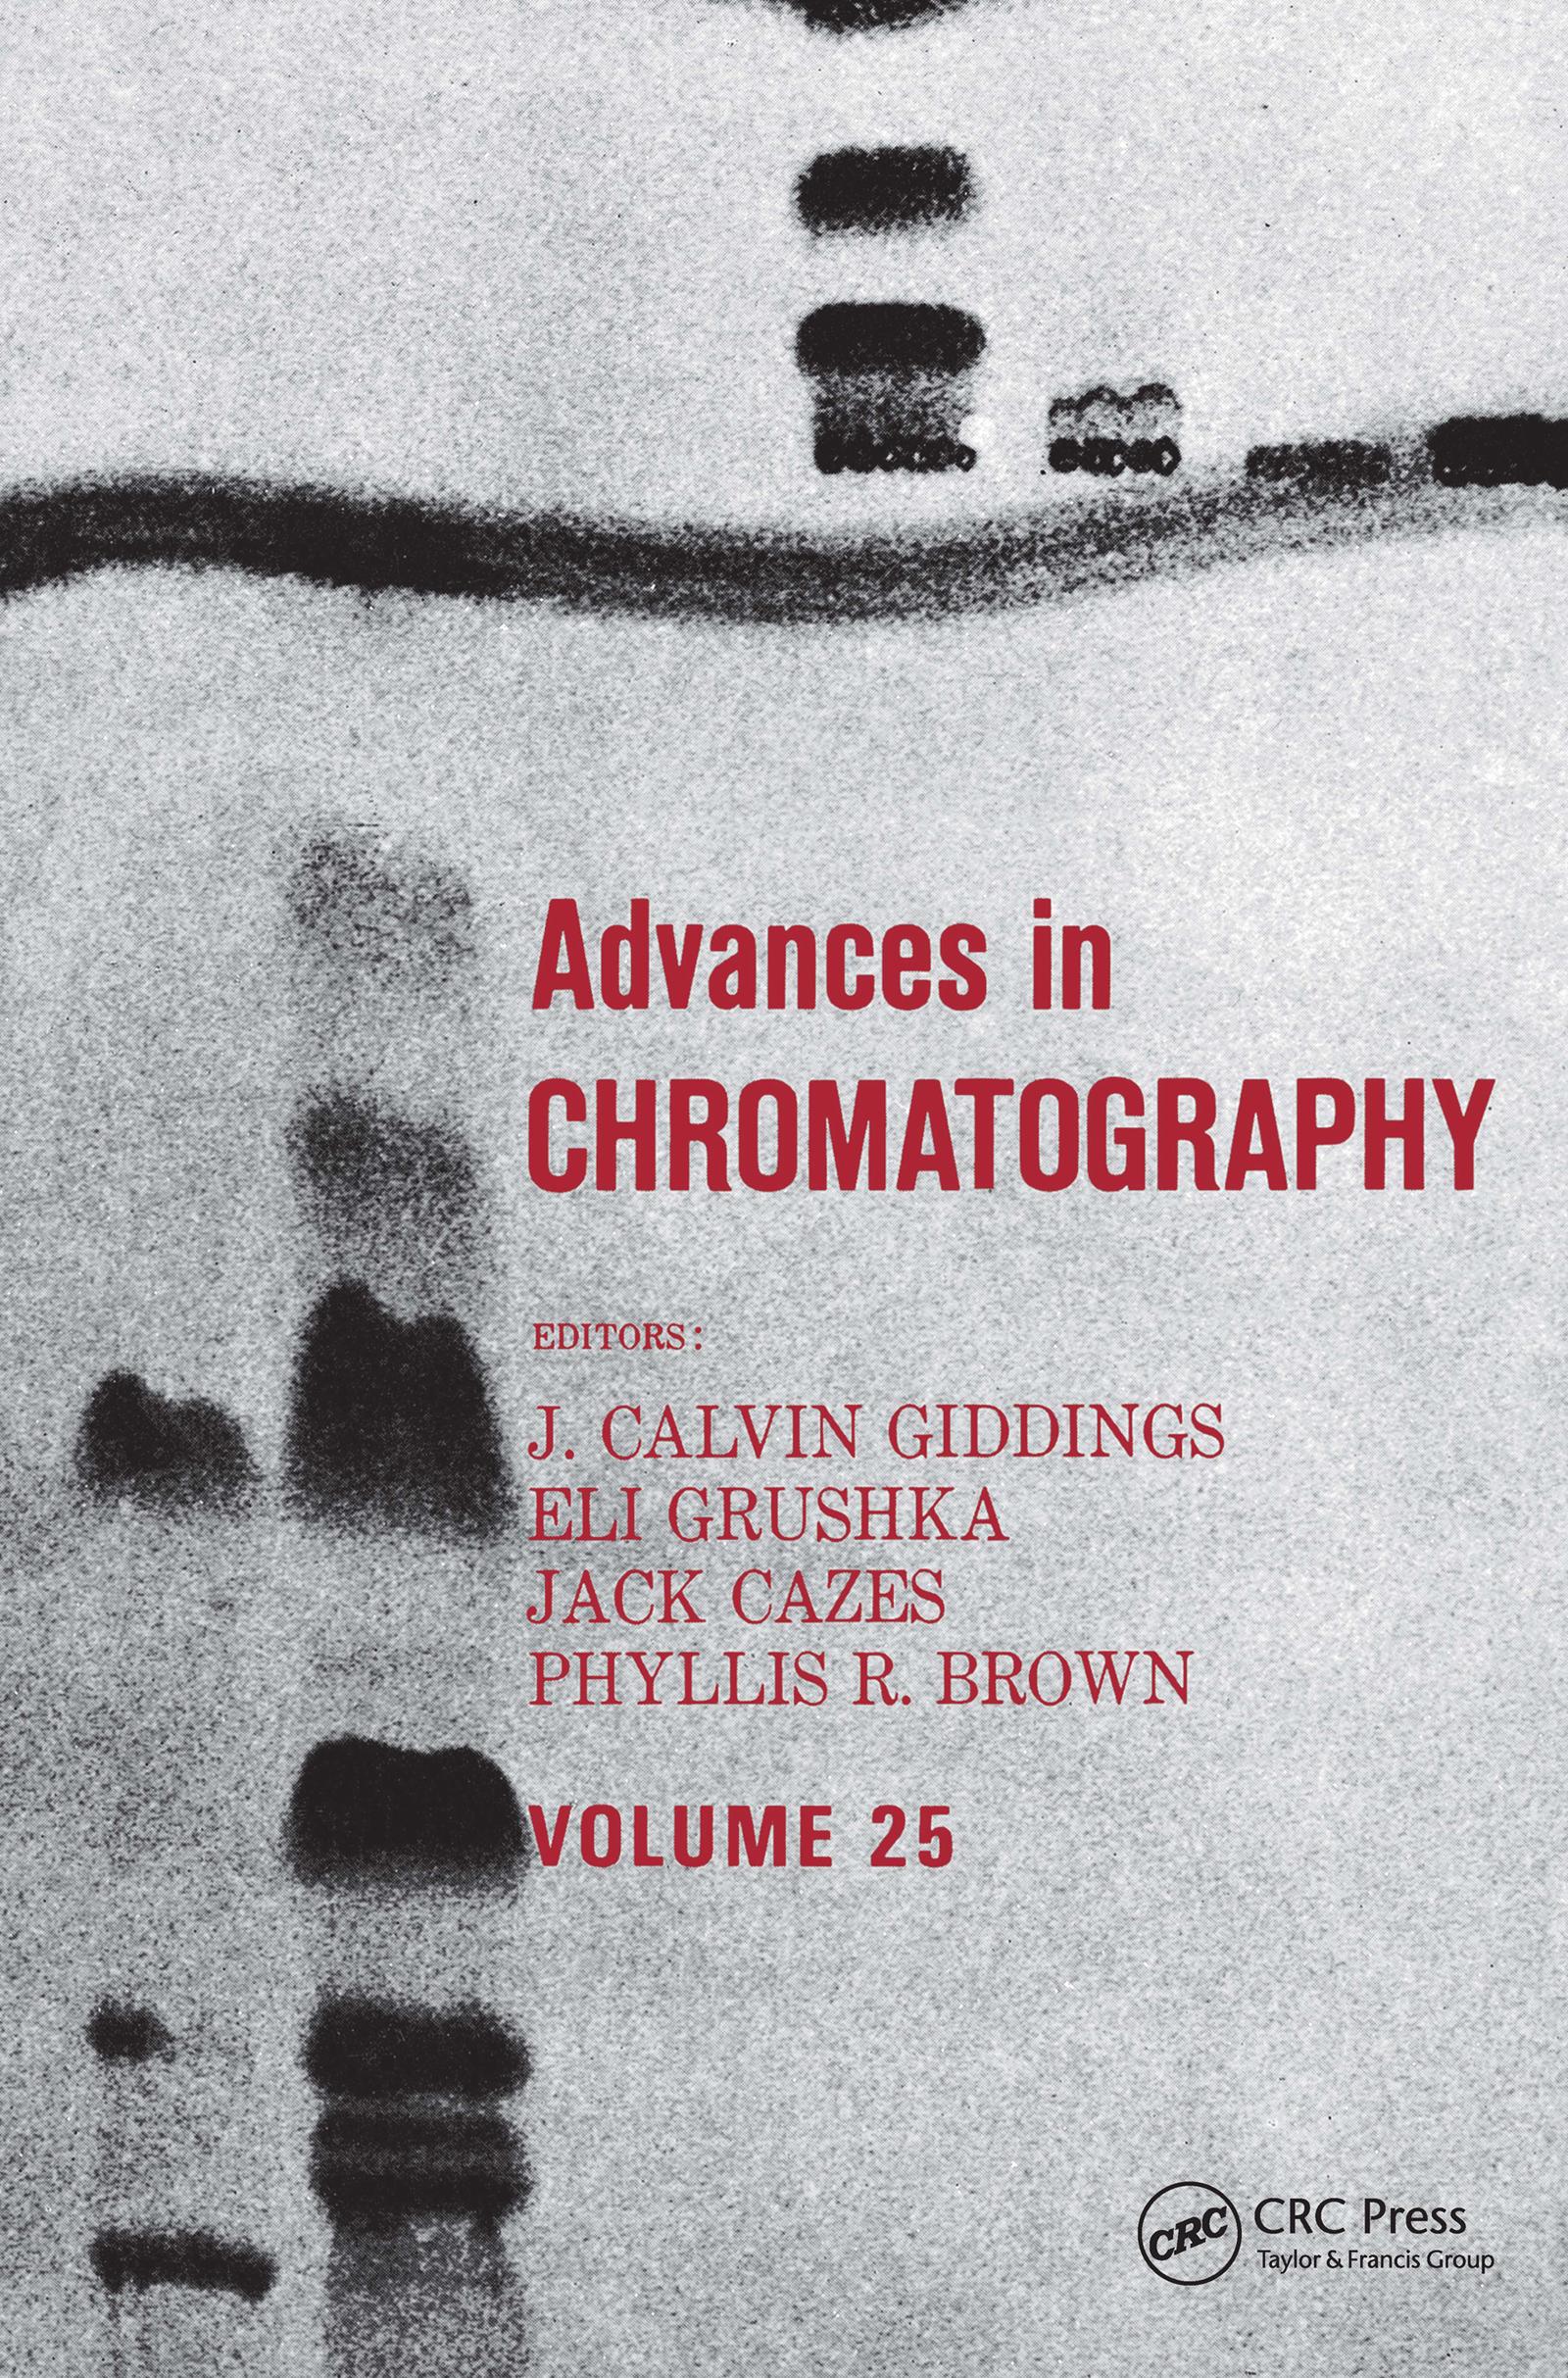 Advances in Chromatography: Volume 25 book cover